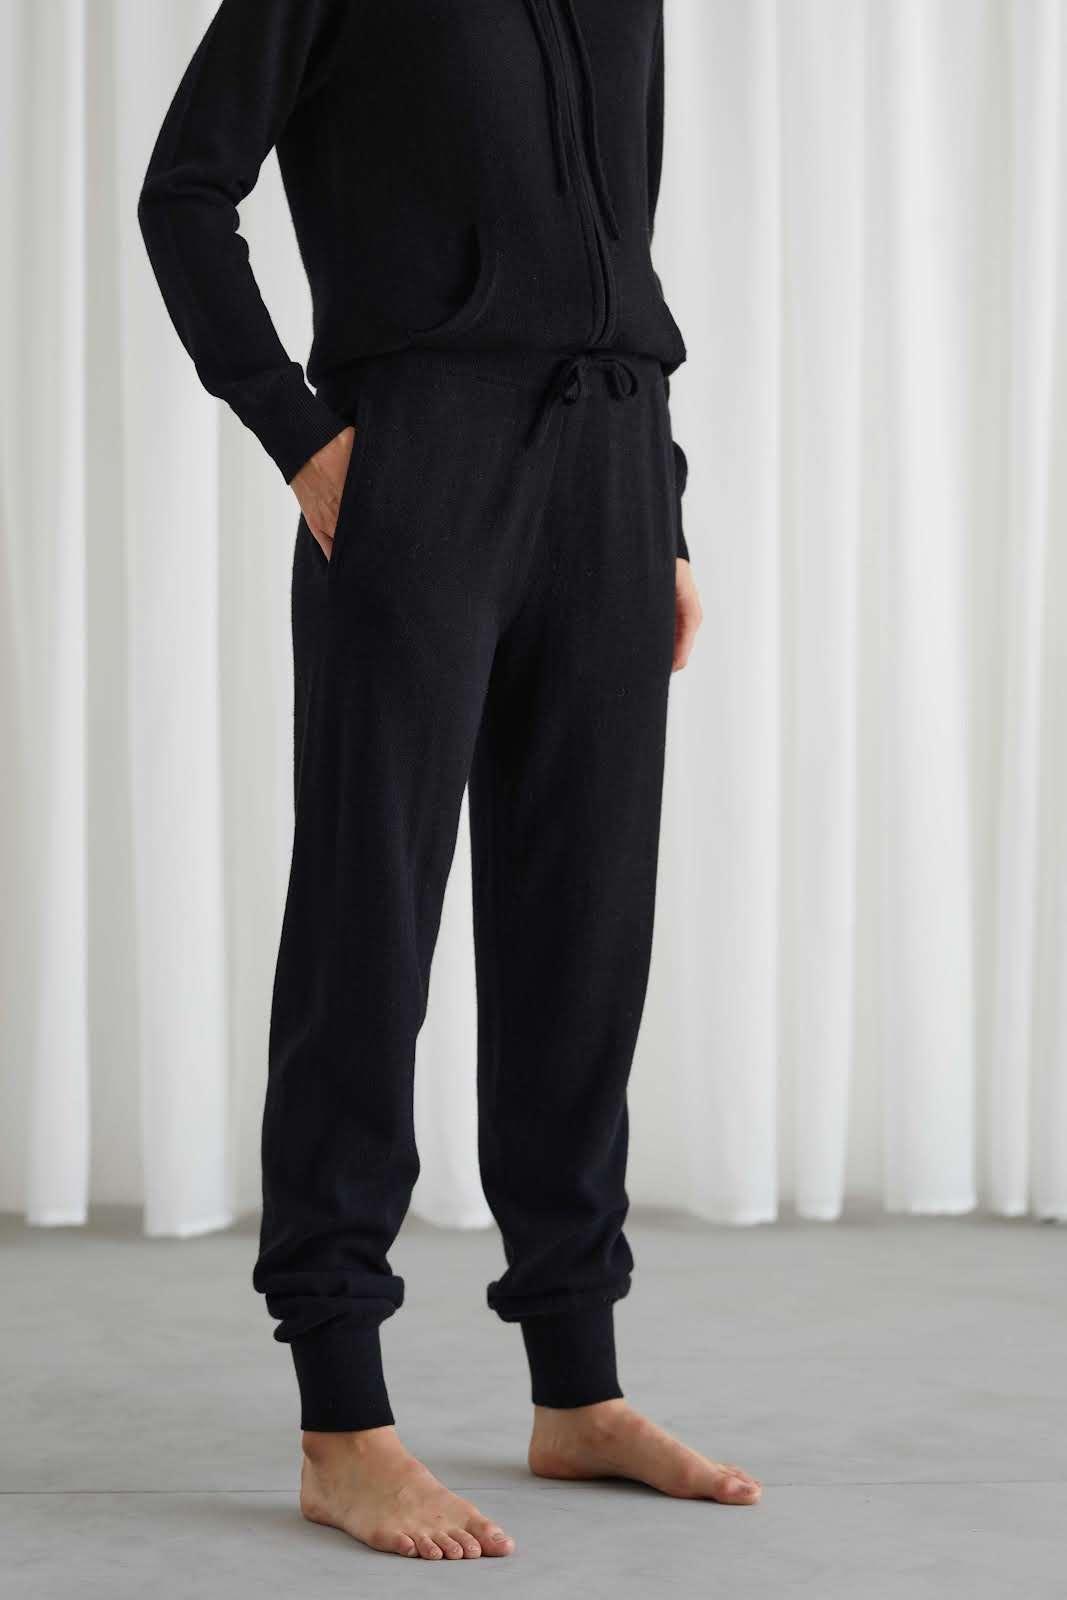 Pants Pockets